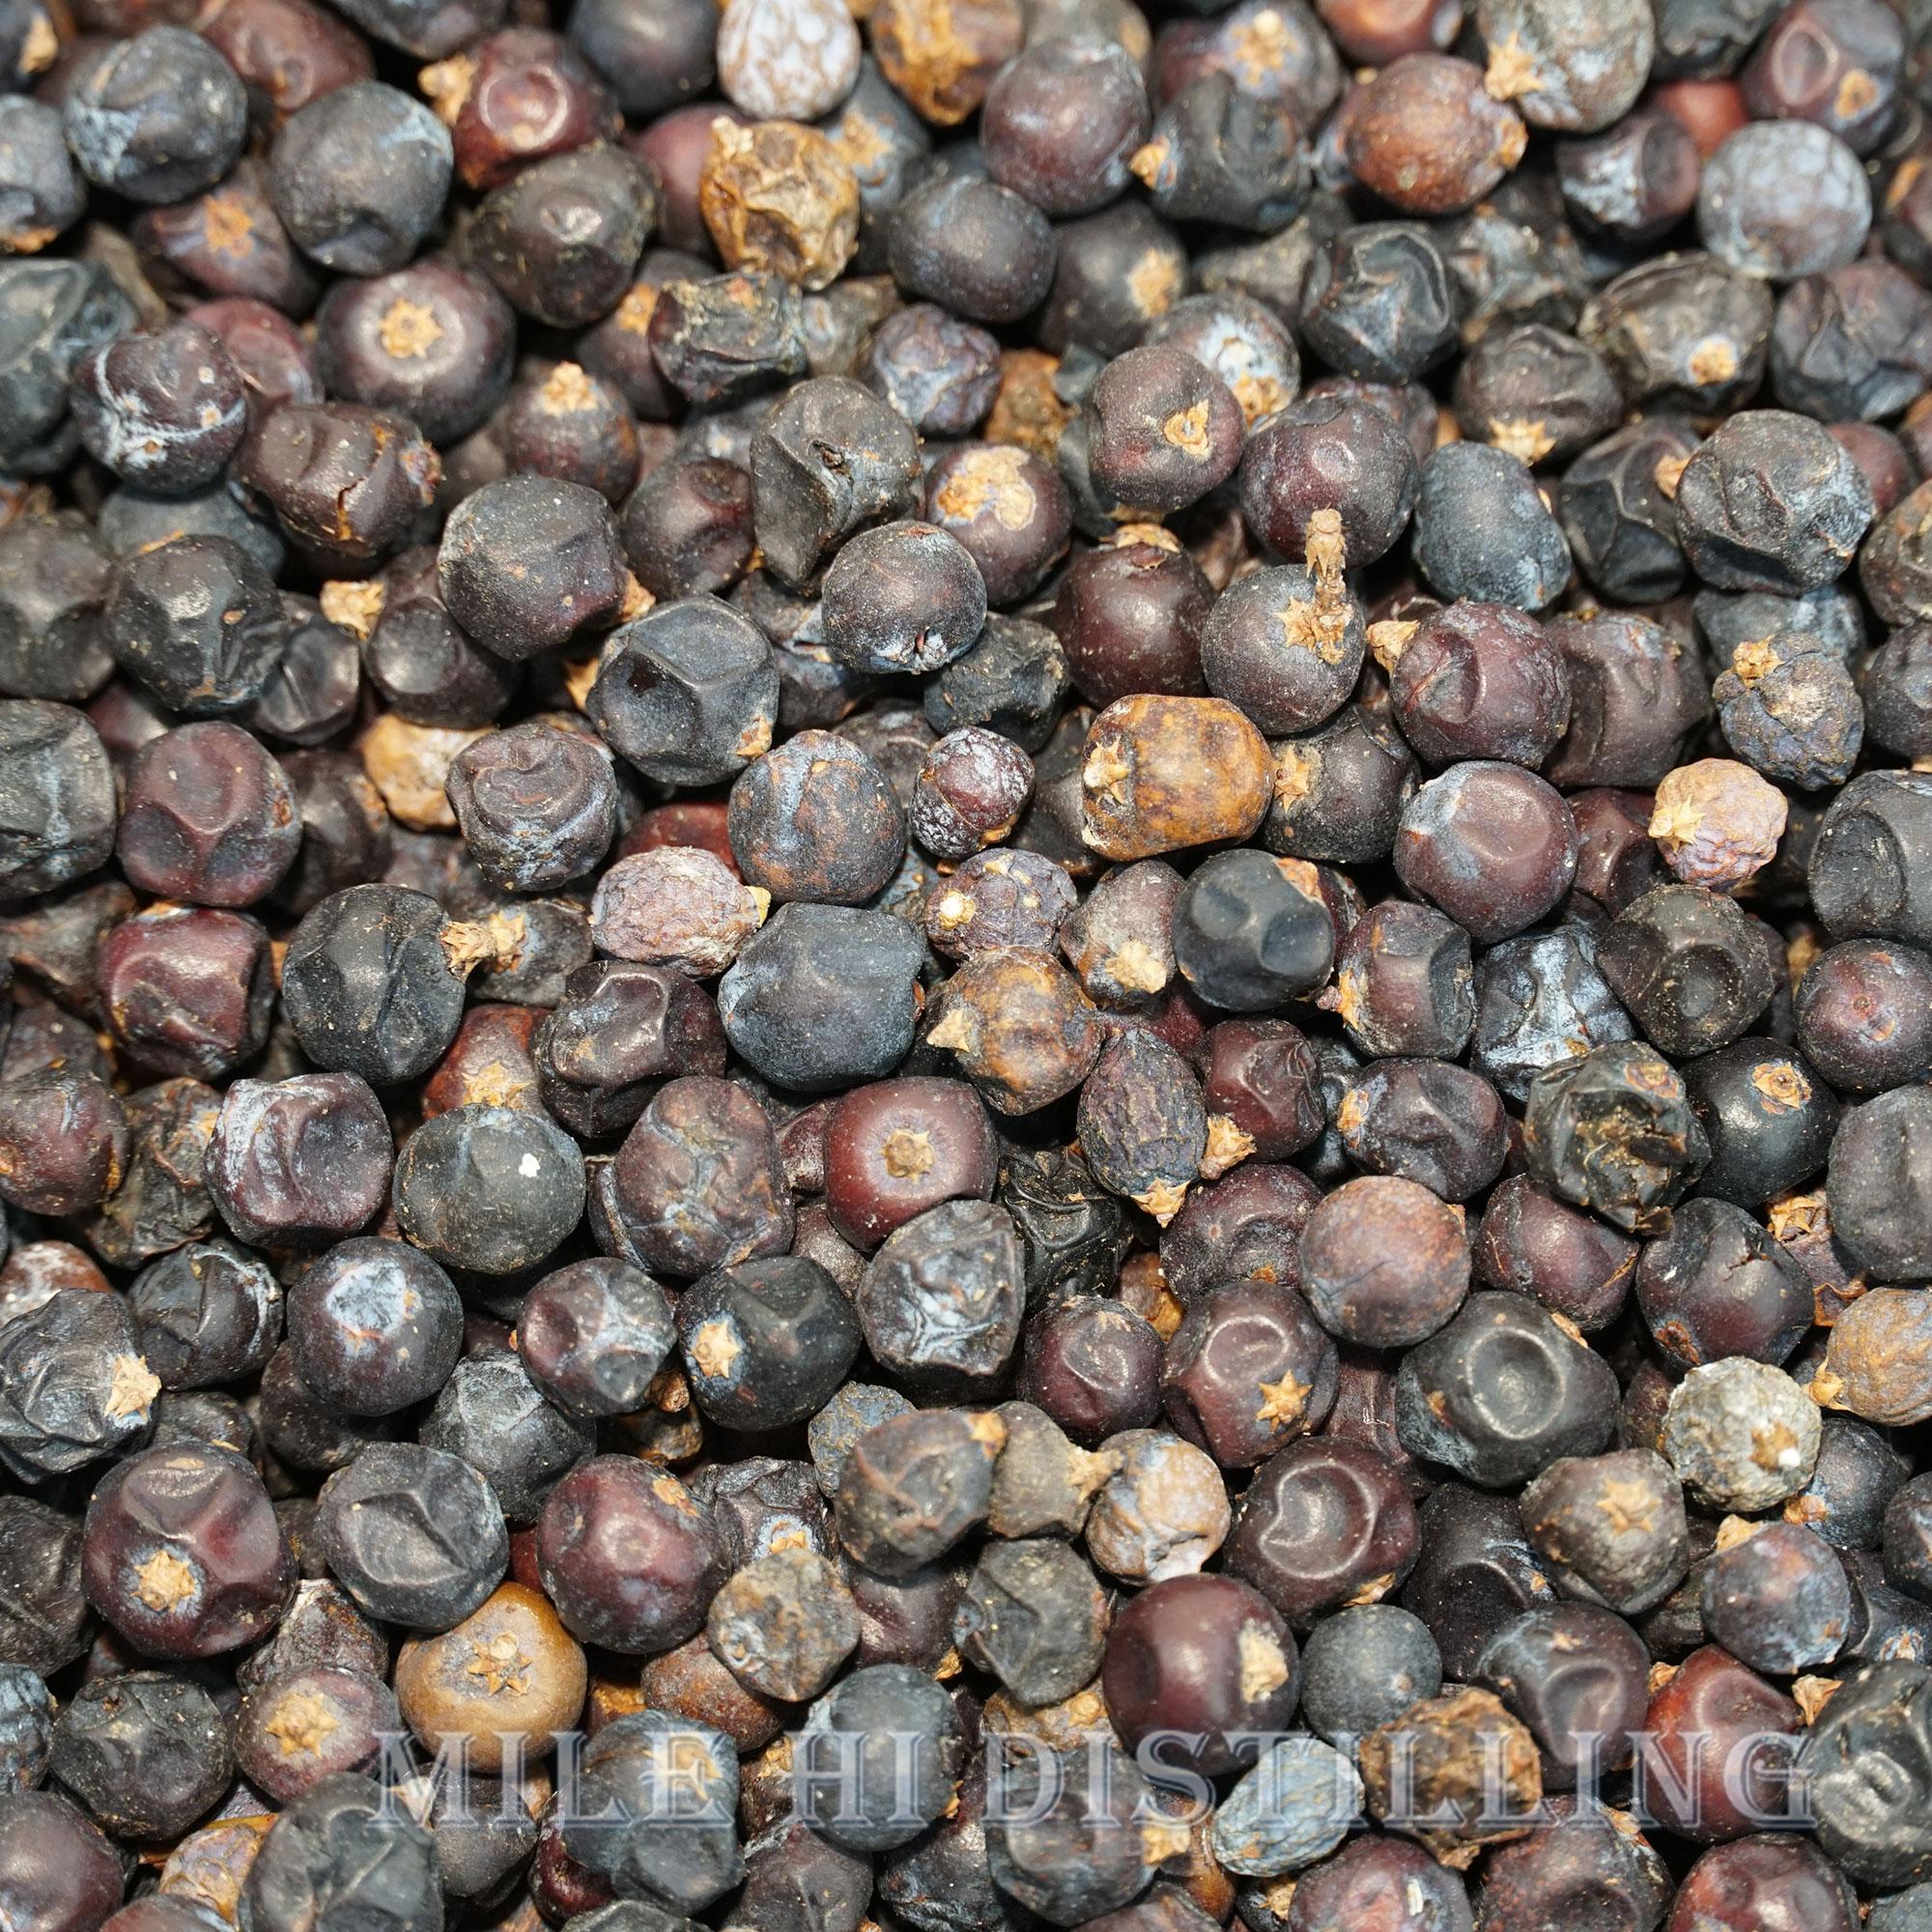 Juniper Berries Distilling Supplies